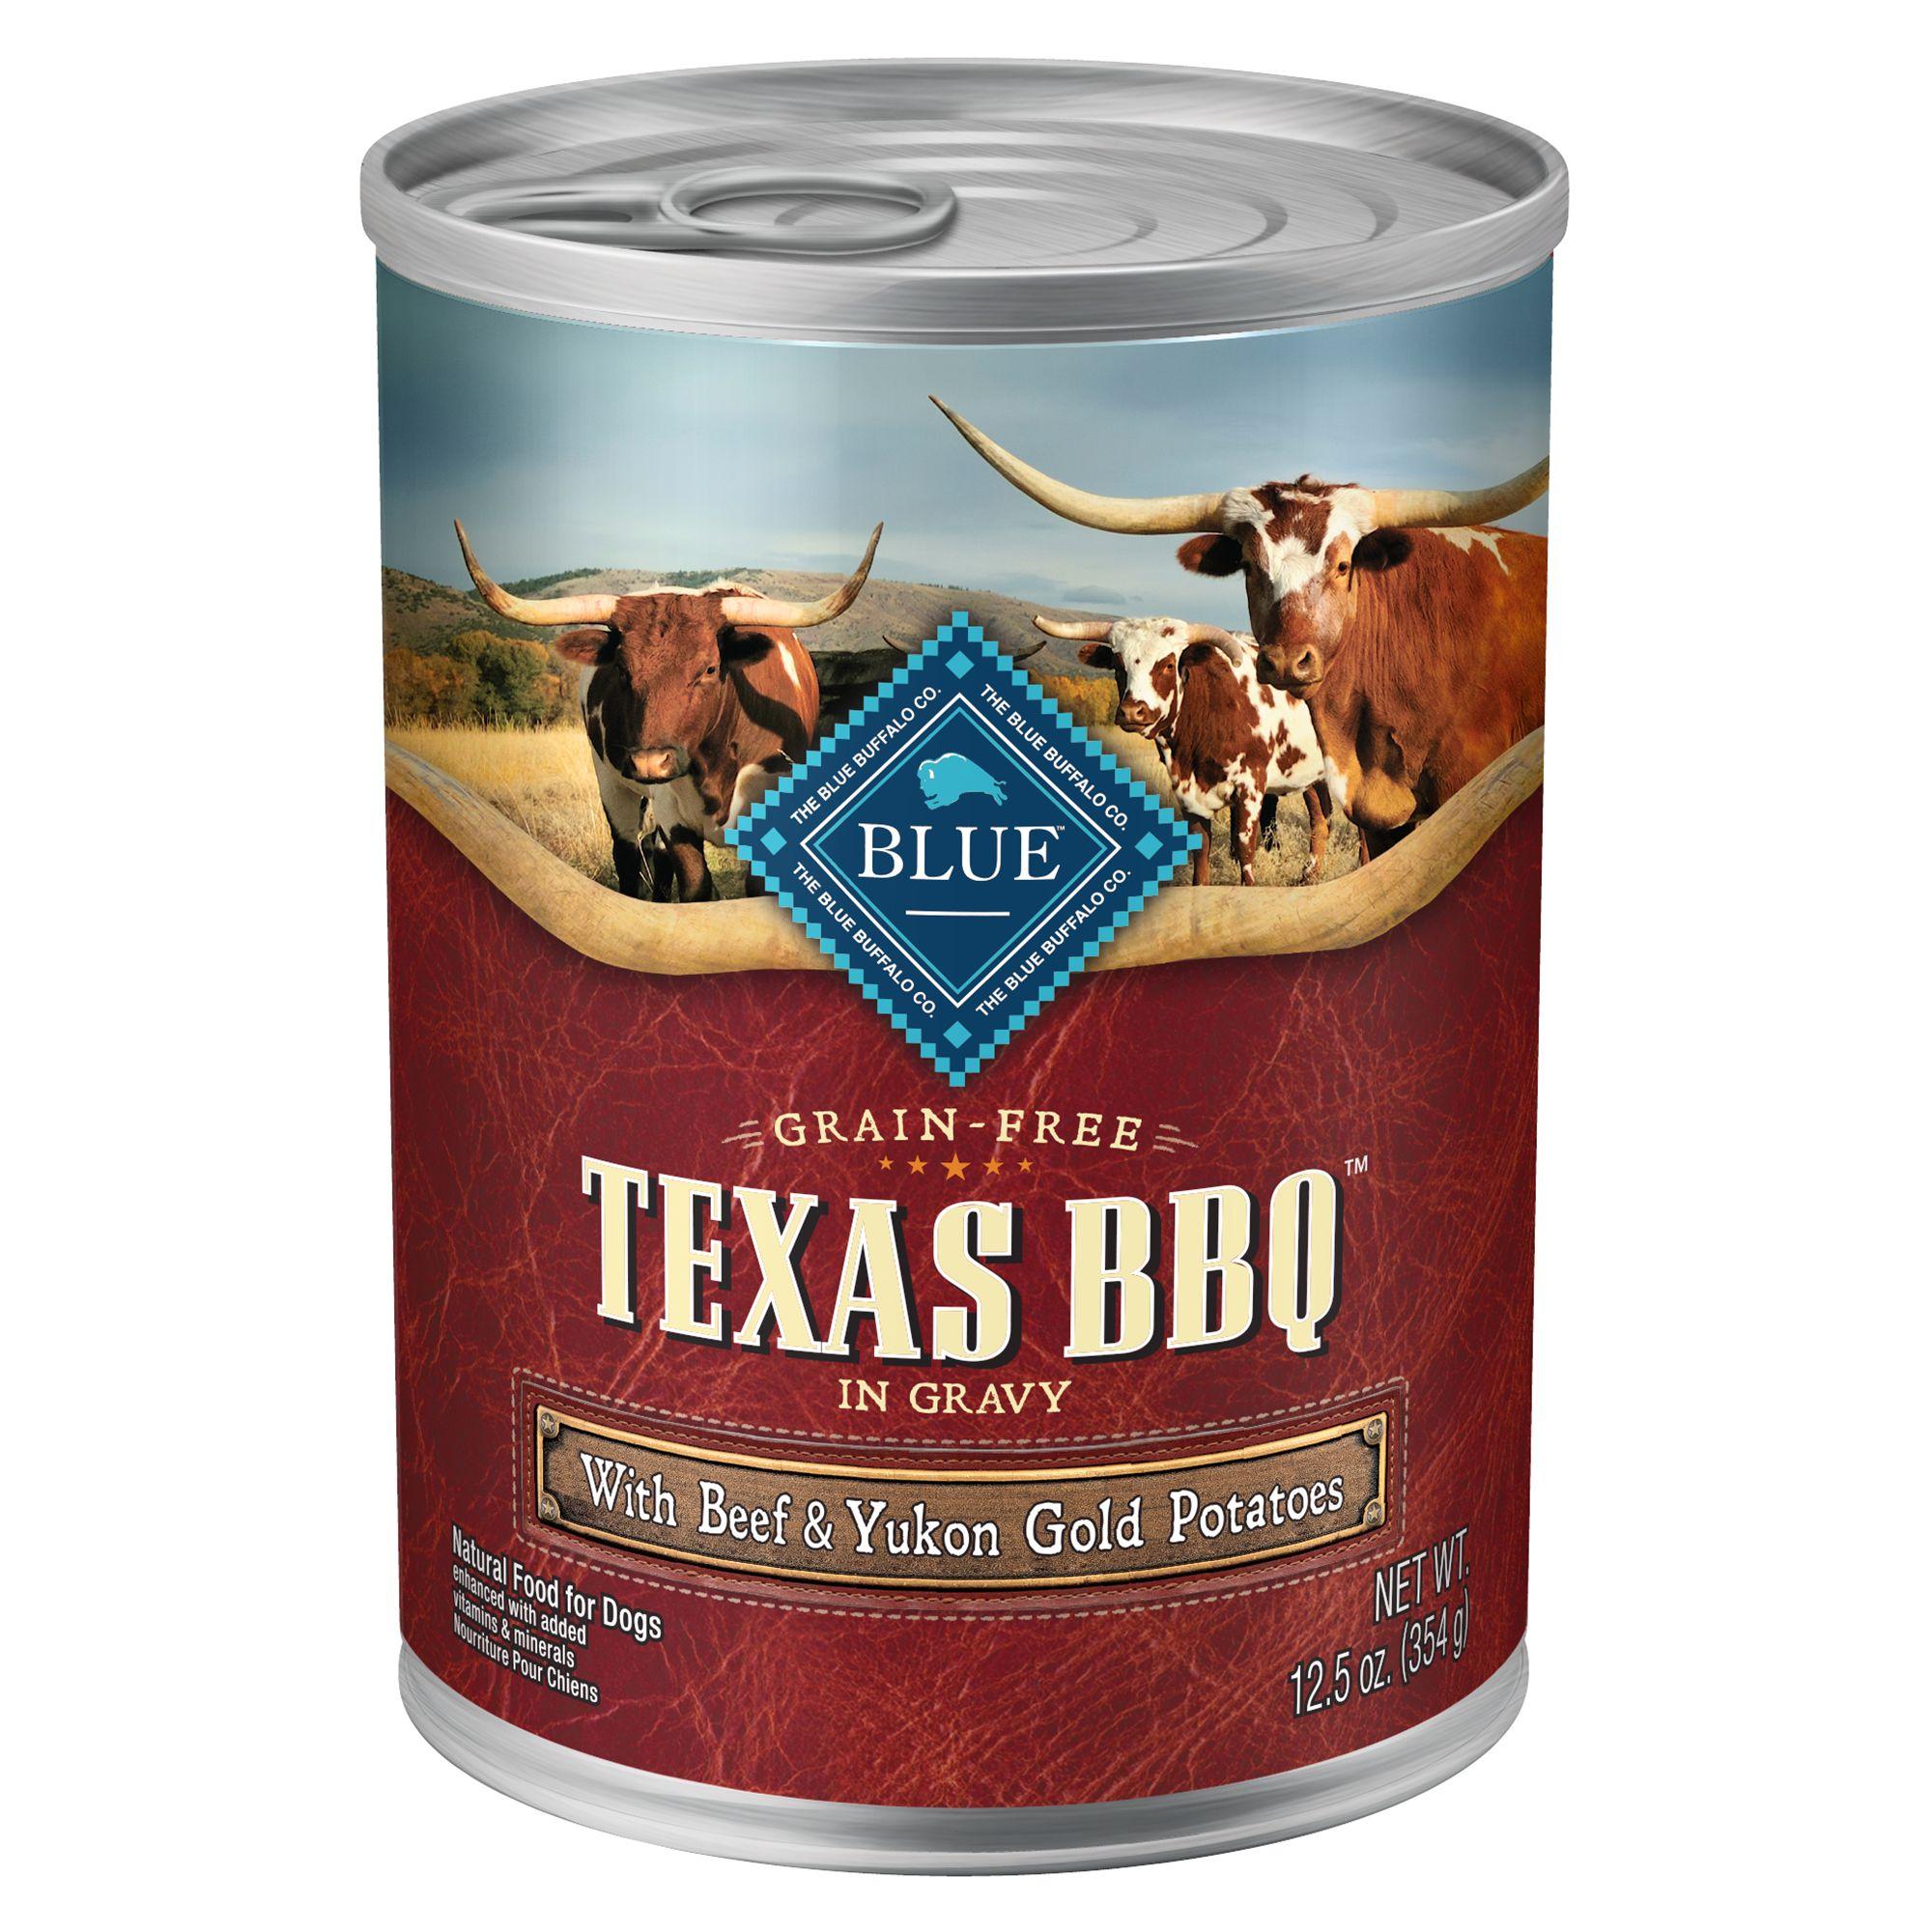 Blue Texas BBQ Dog Food Natural, Grain Free, Beef